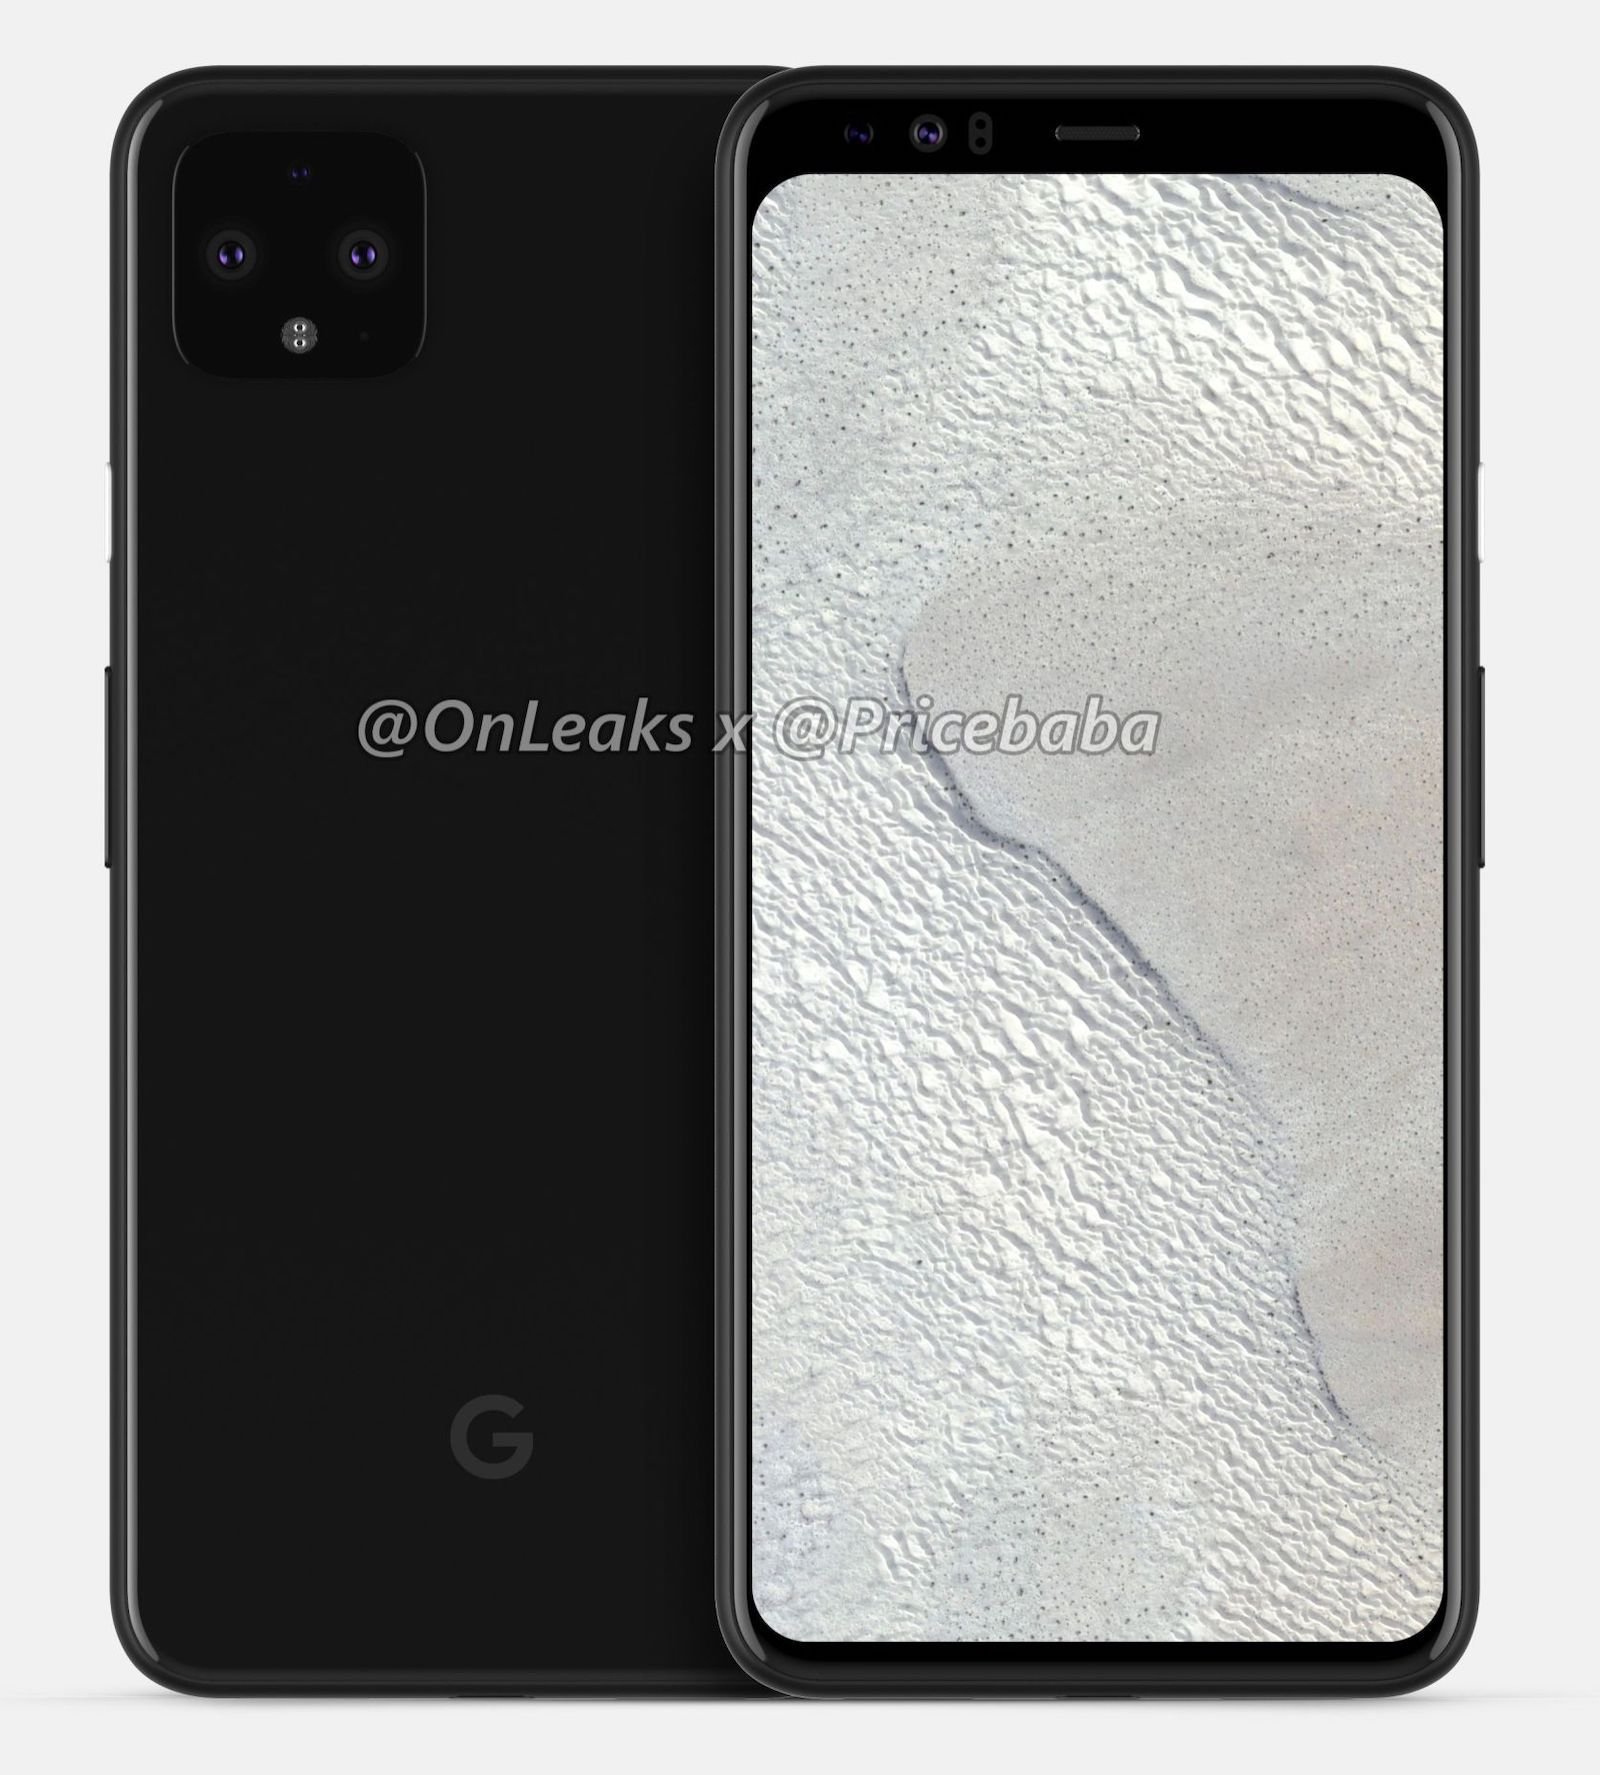 Pixel 4 XL Render